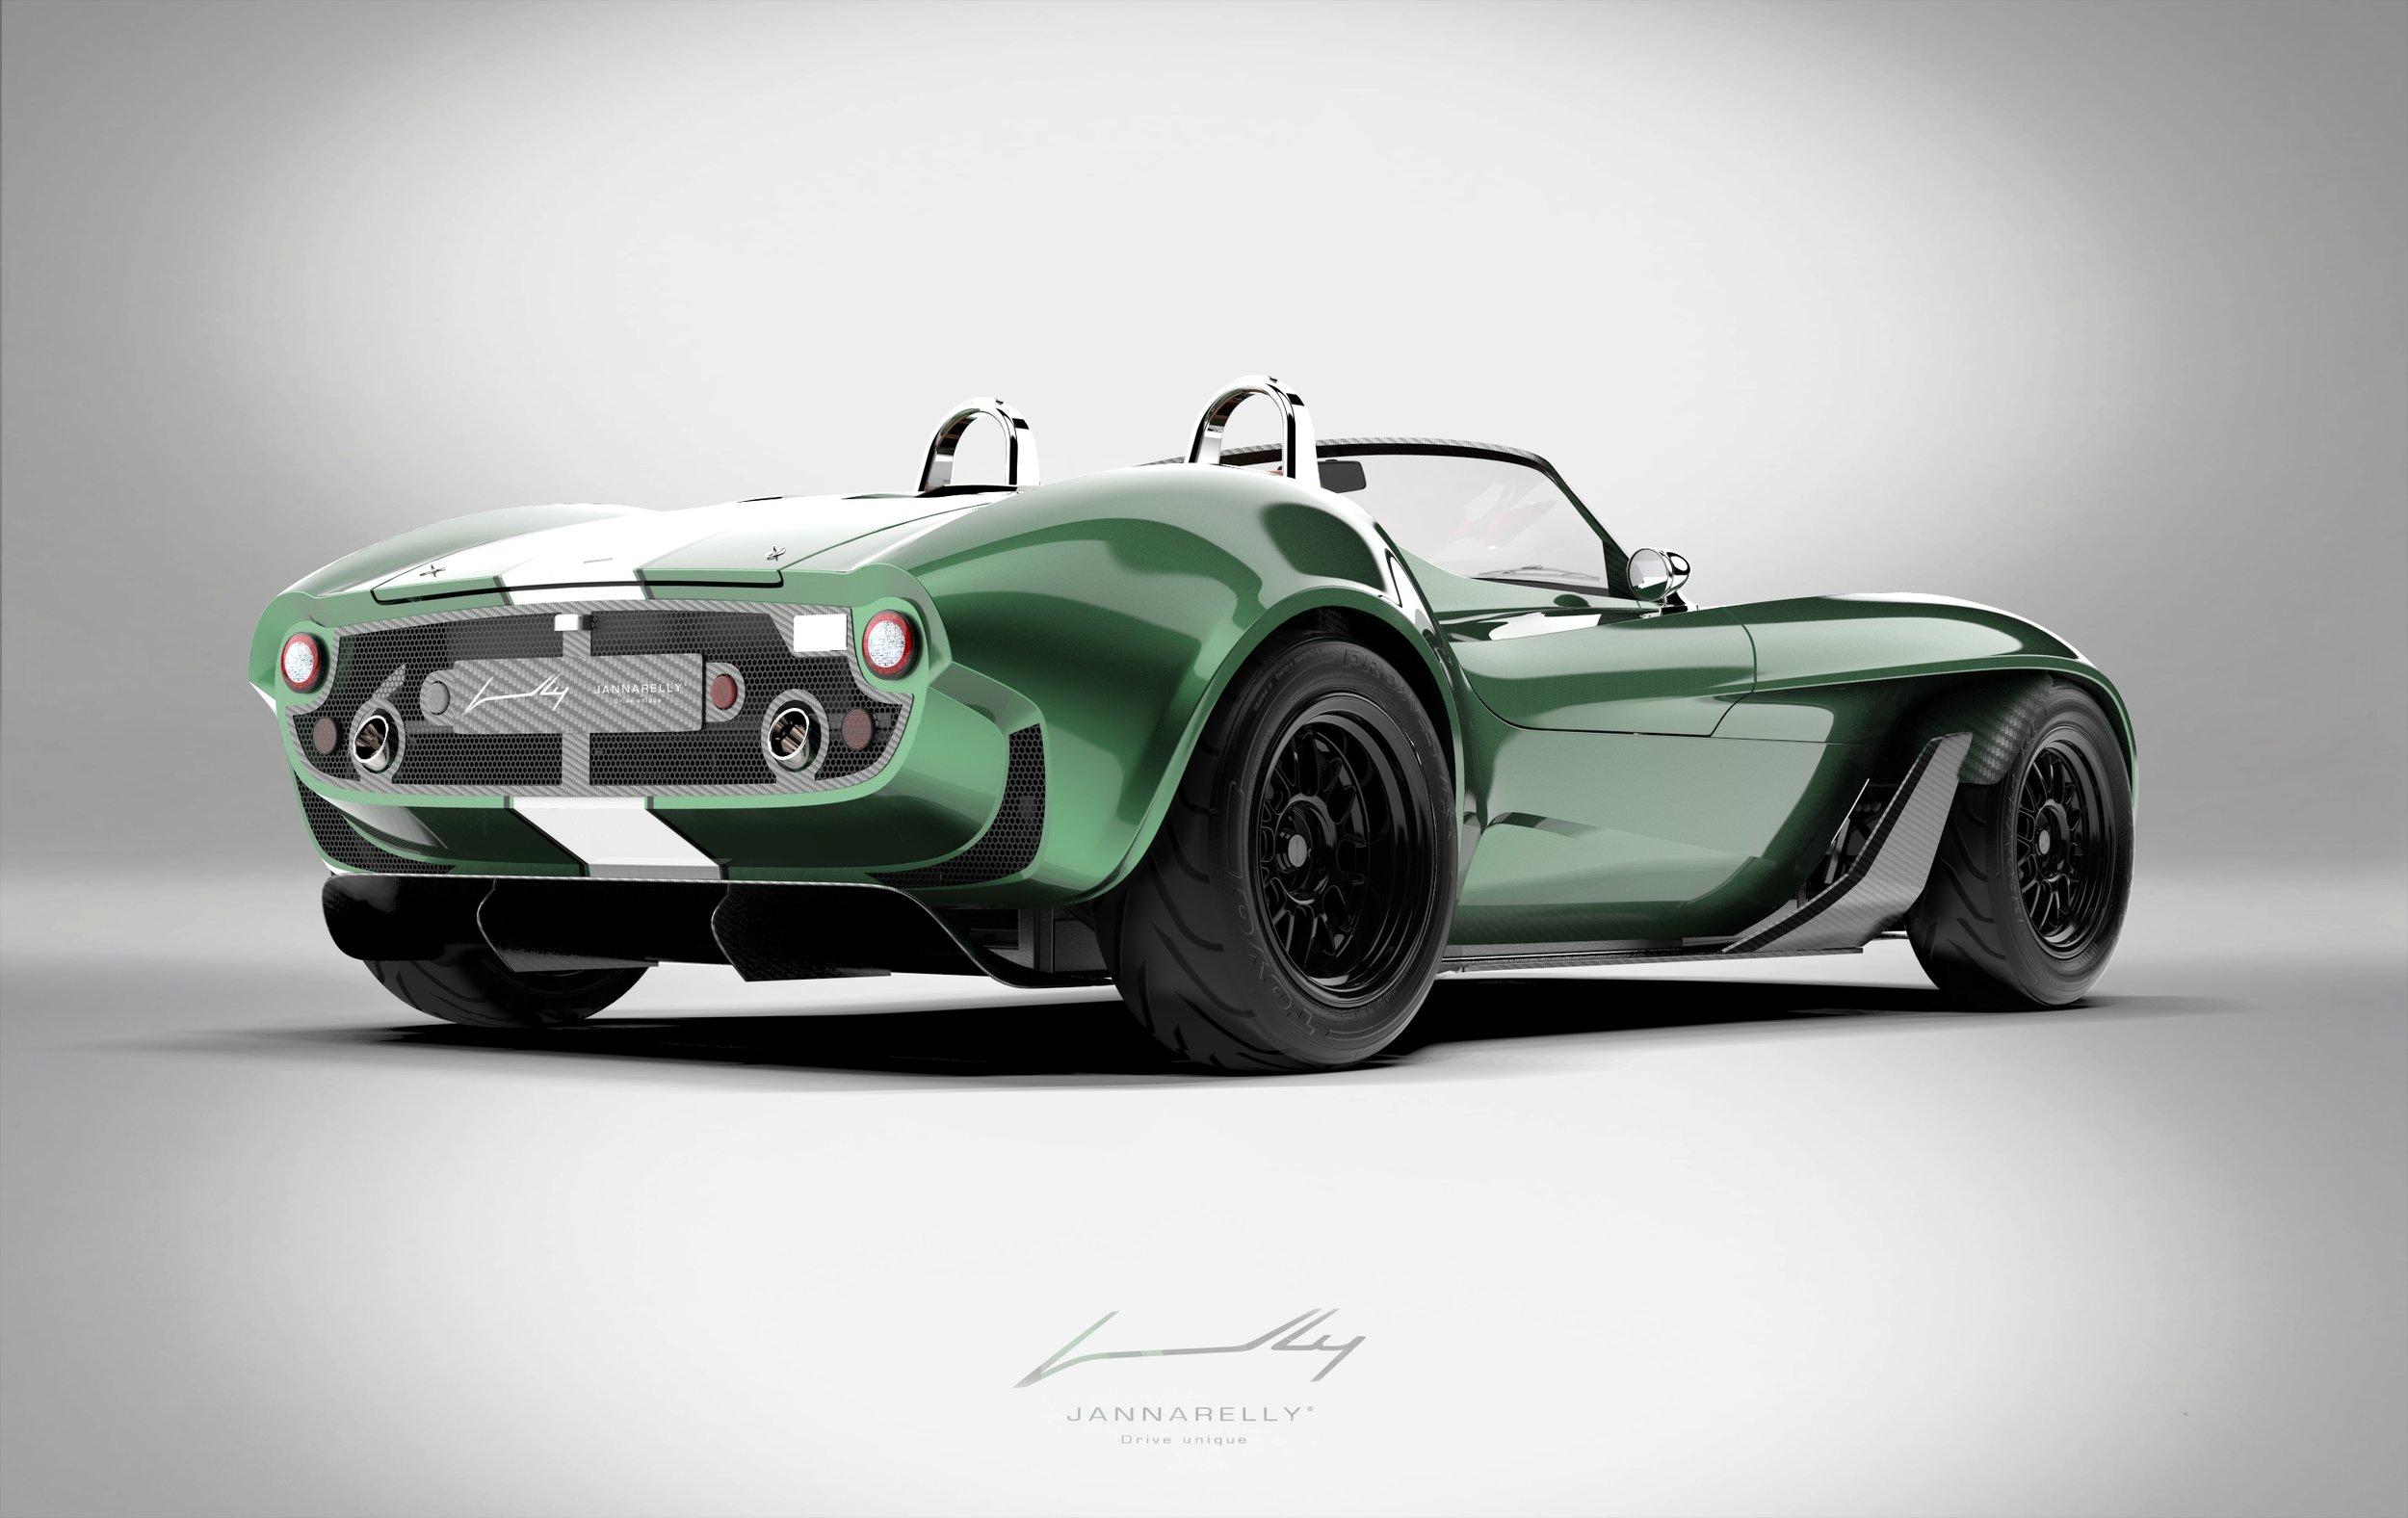 J design1 roadster.328.jpg